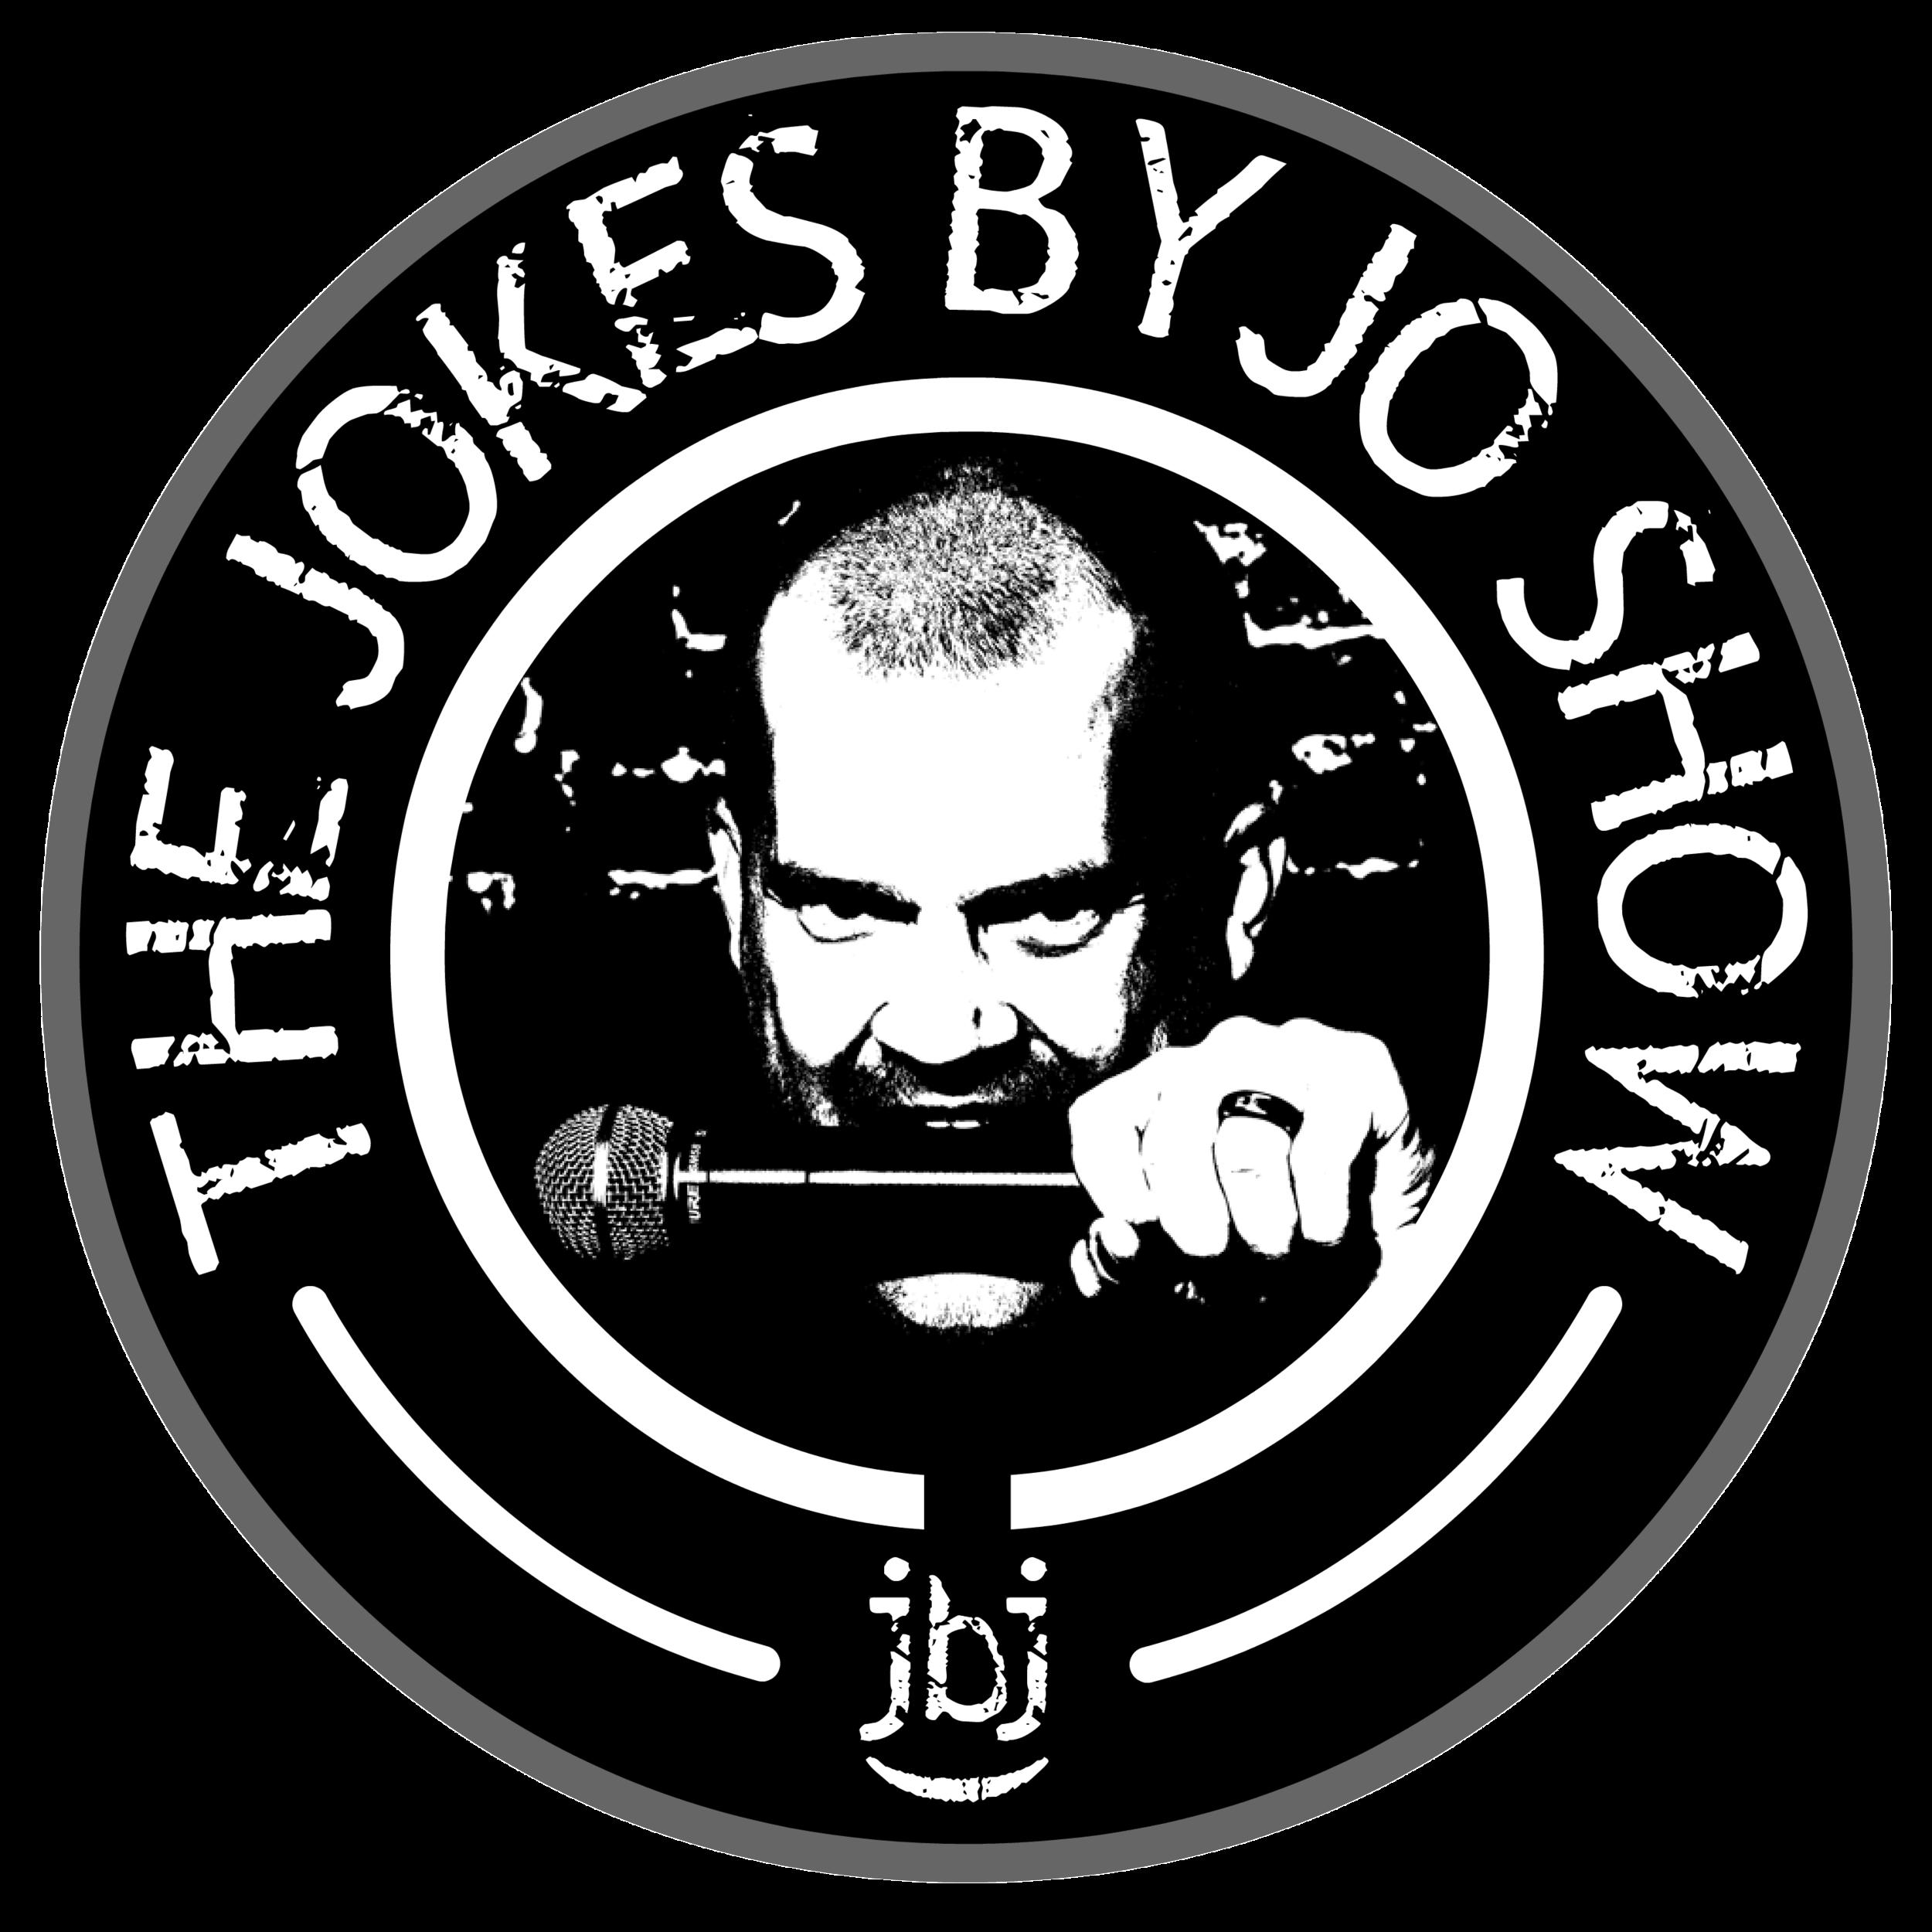 jokesbyjoshow_logo.png